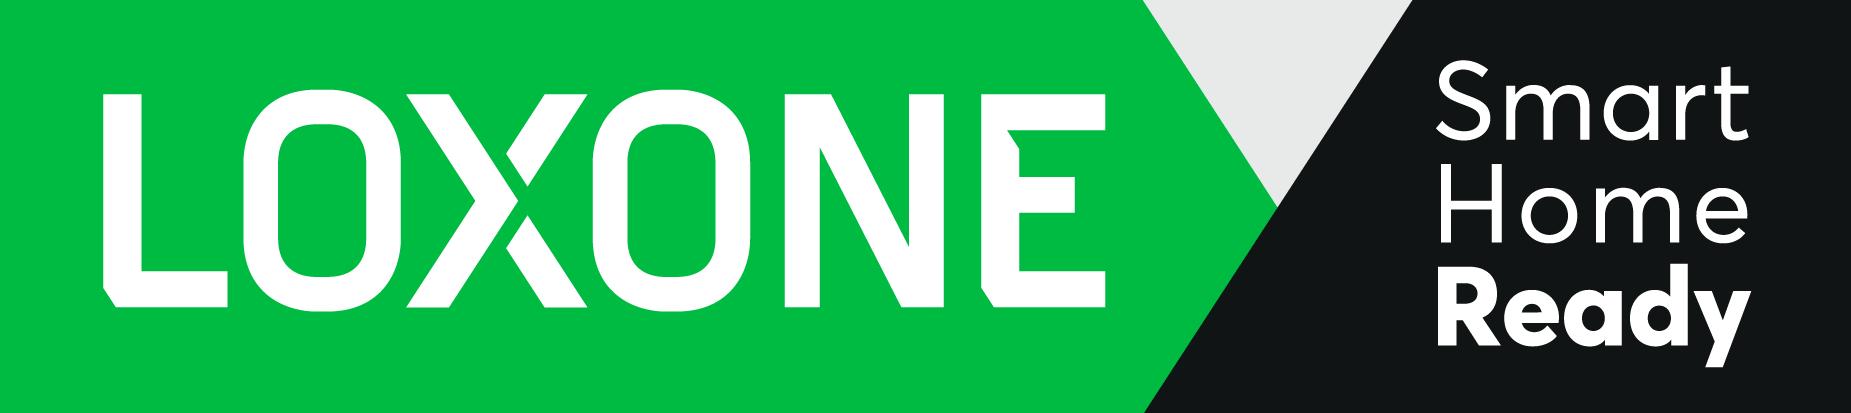 označení Loxone smart home ready 100% kompabilita